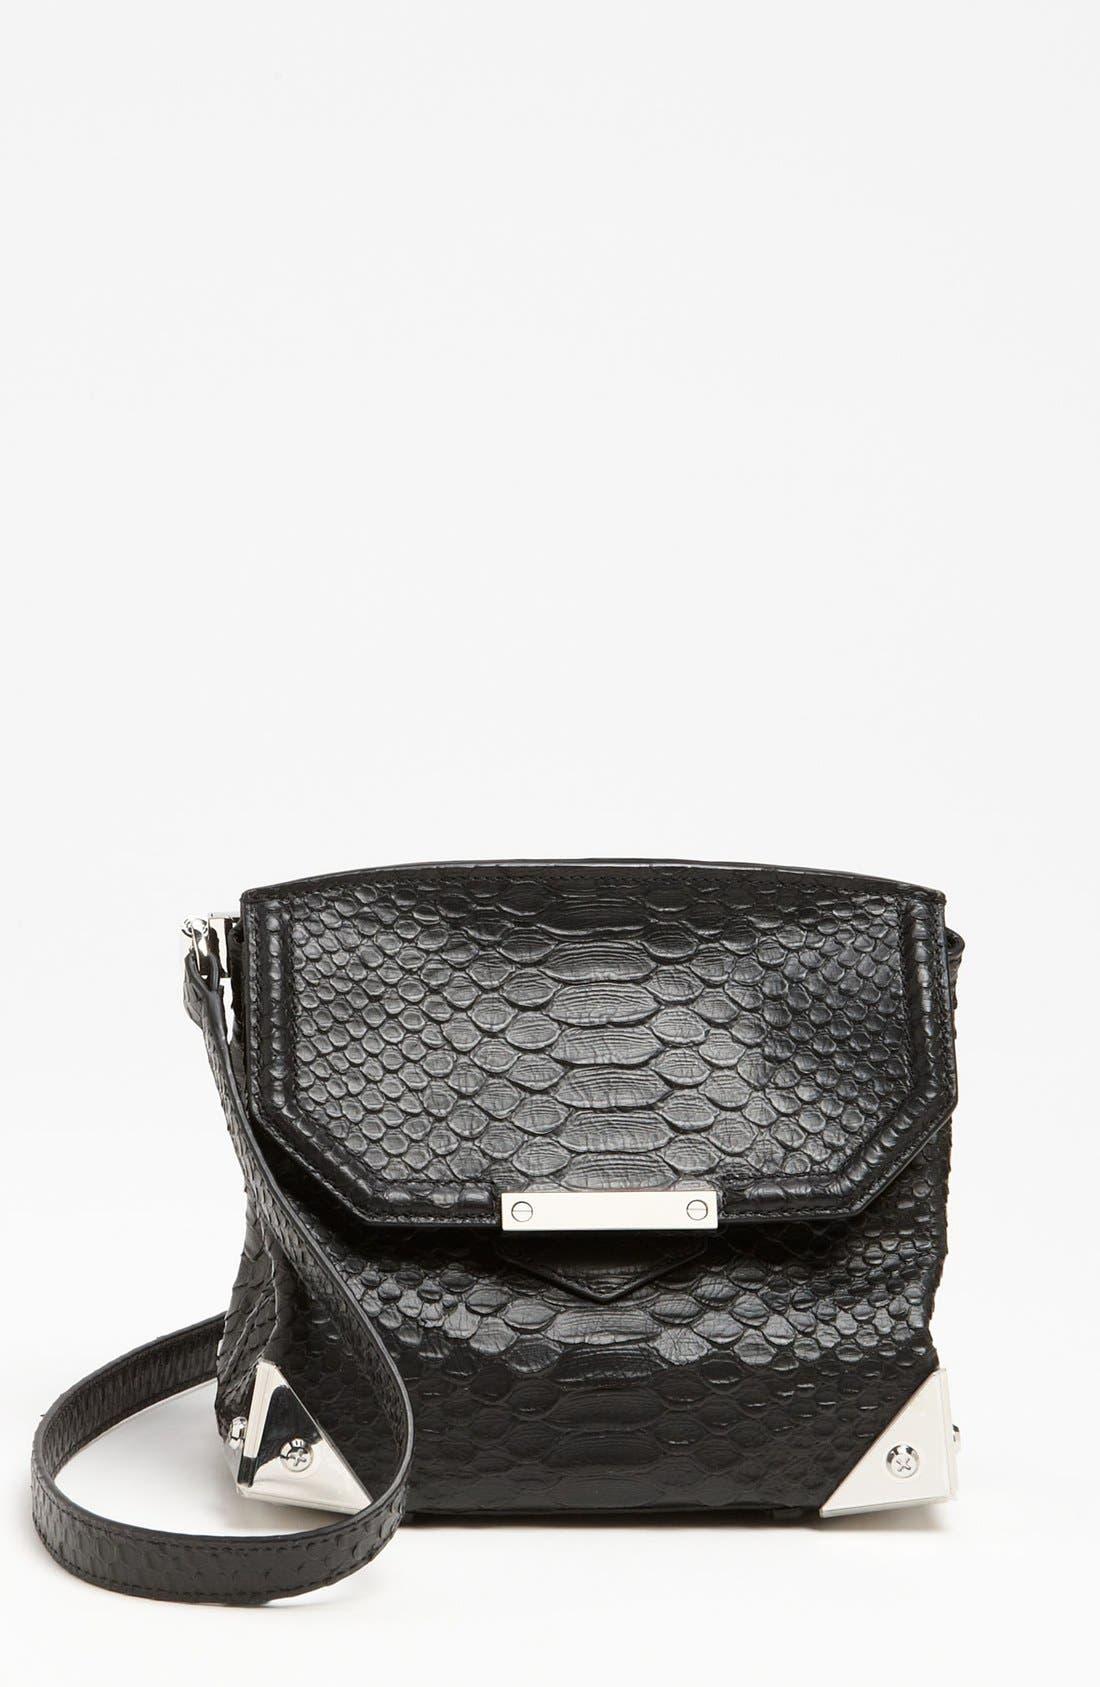 Alternate Image 1 Selected - Alexander Wang 'Marion - Prisma' Python Embossed Leather Crossbody Bag